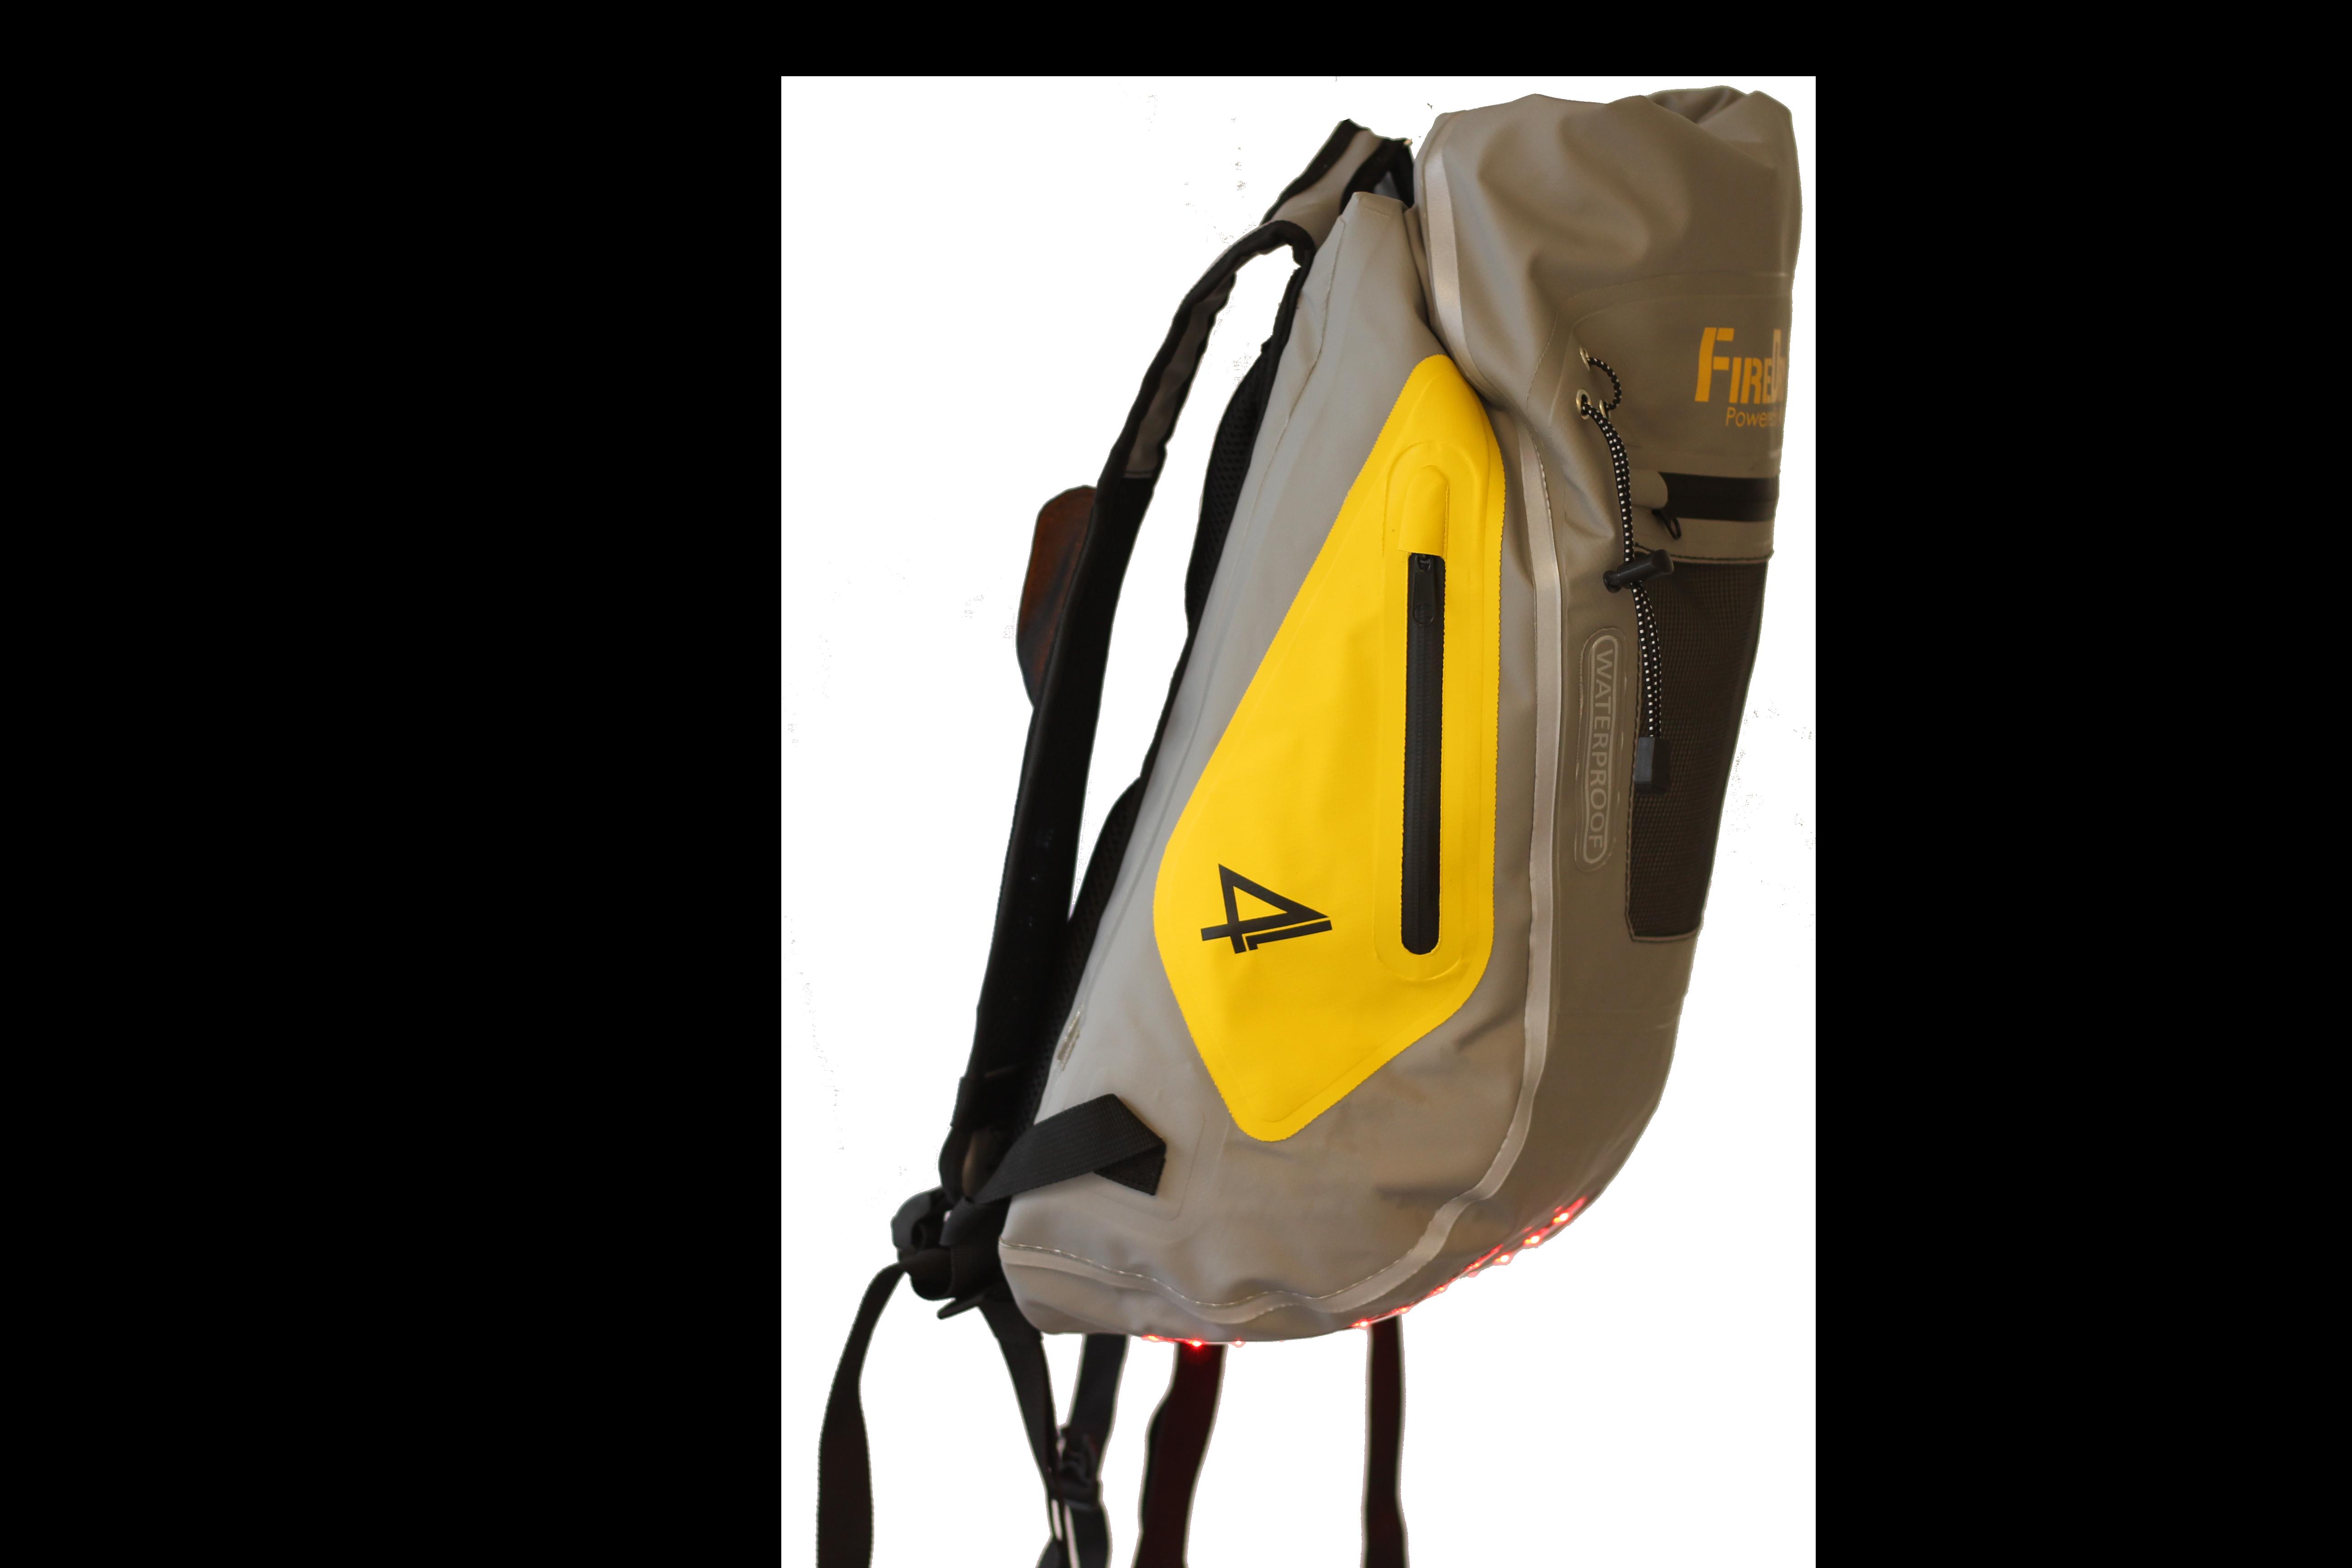 Ryggsäck Firedry grå/gul